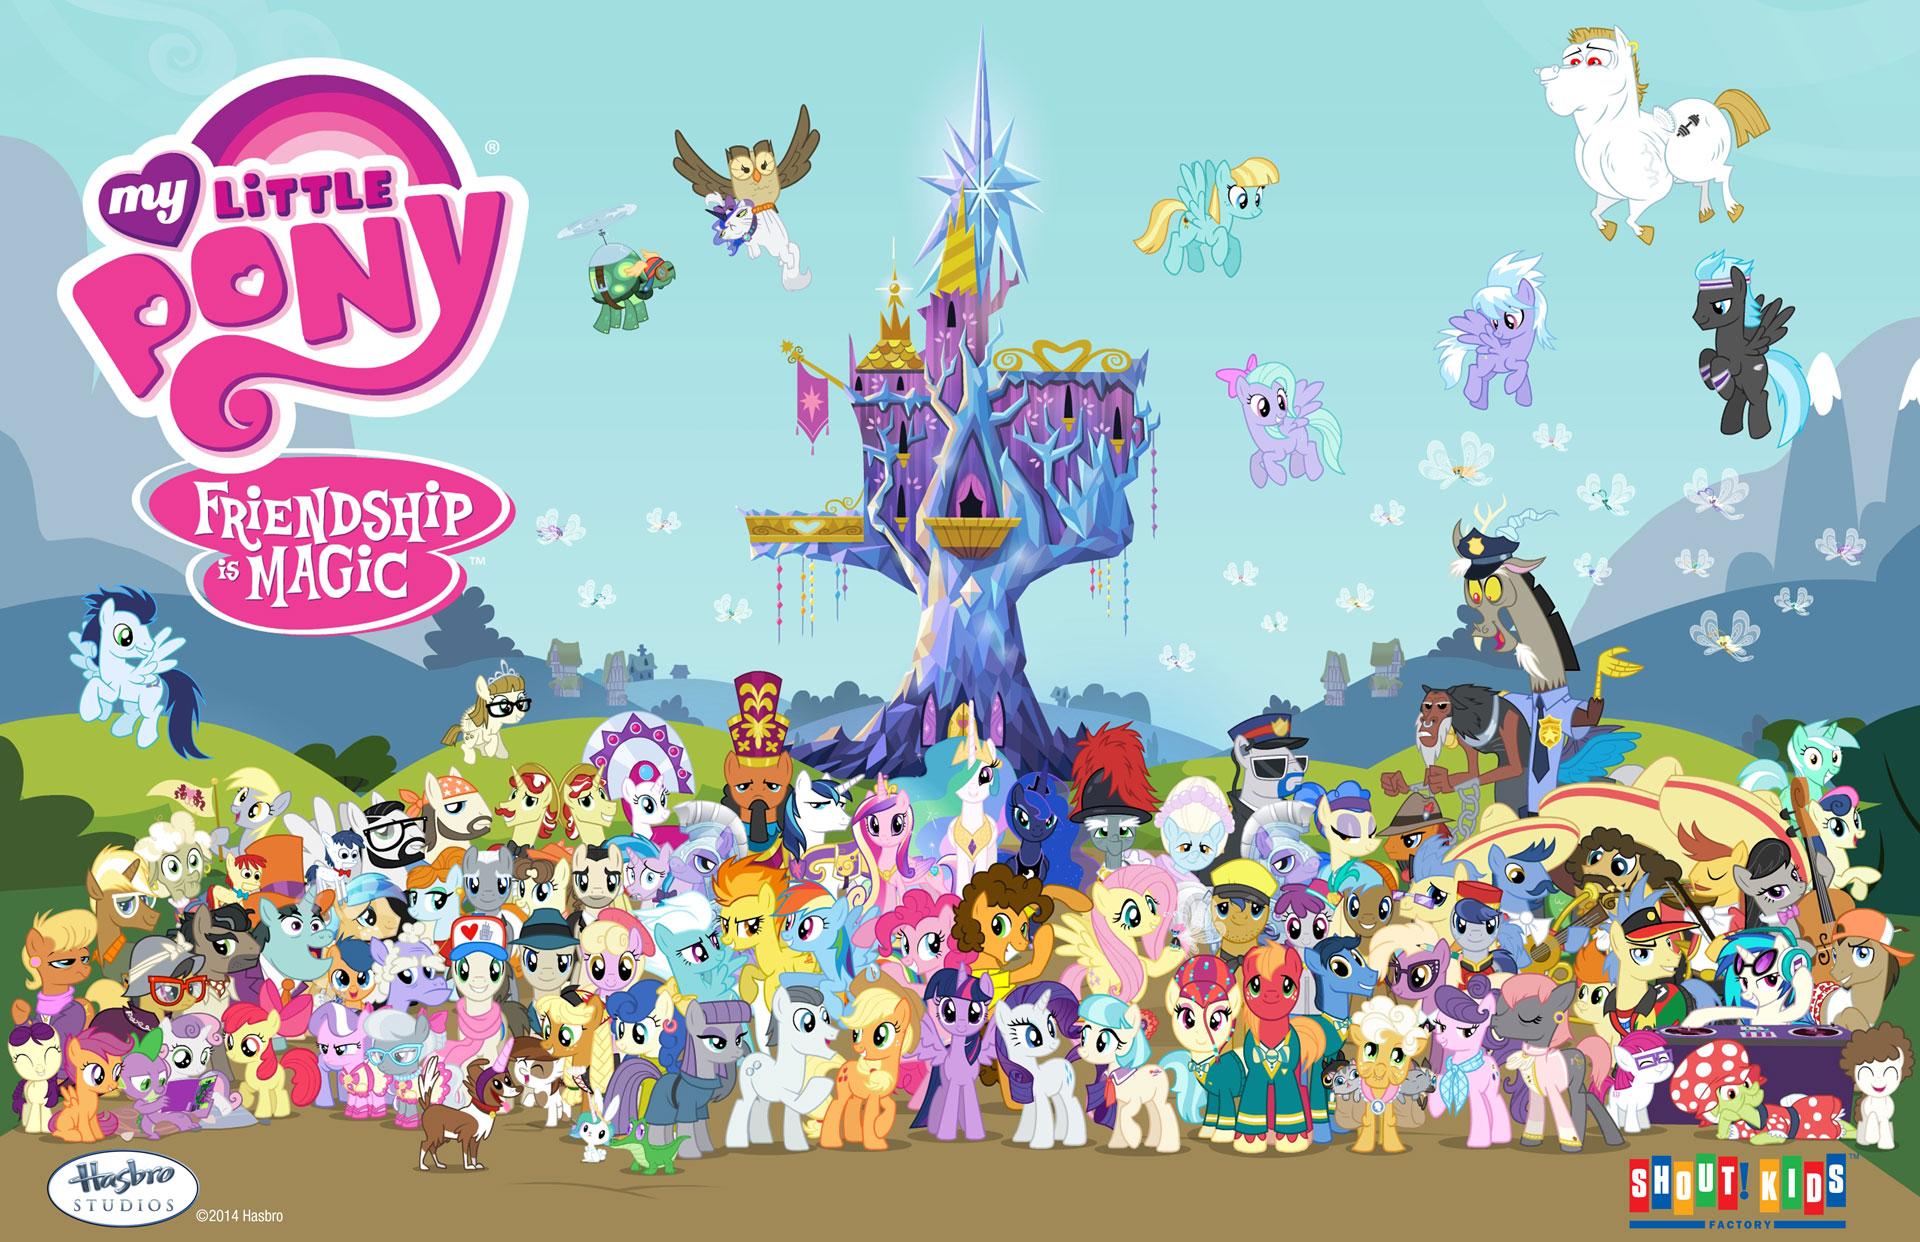 image season 4 poster jpg my little pony friendship is magic